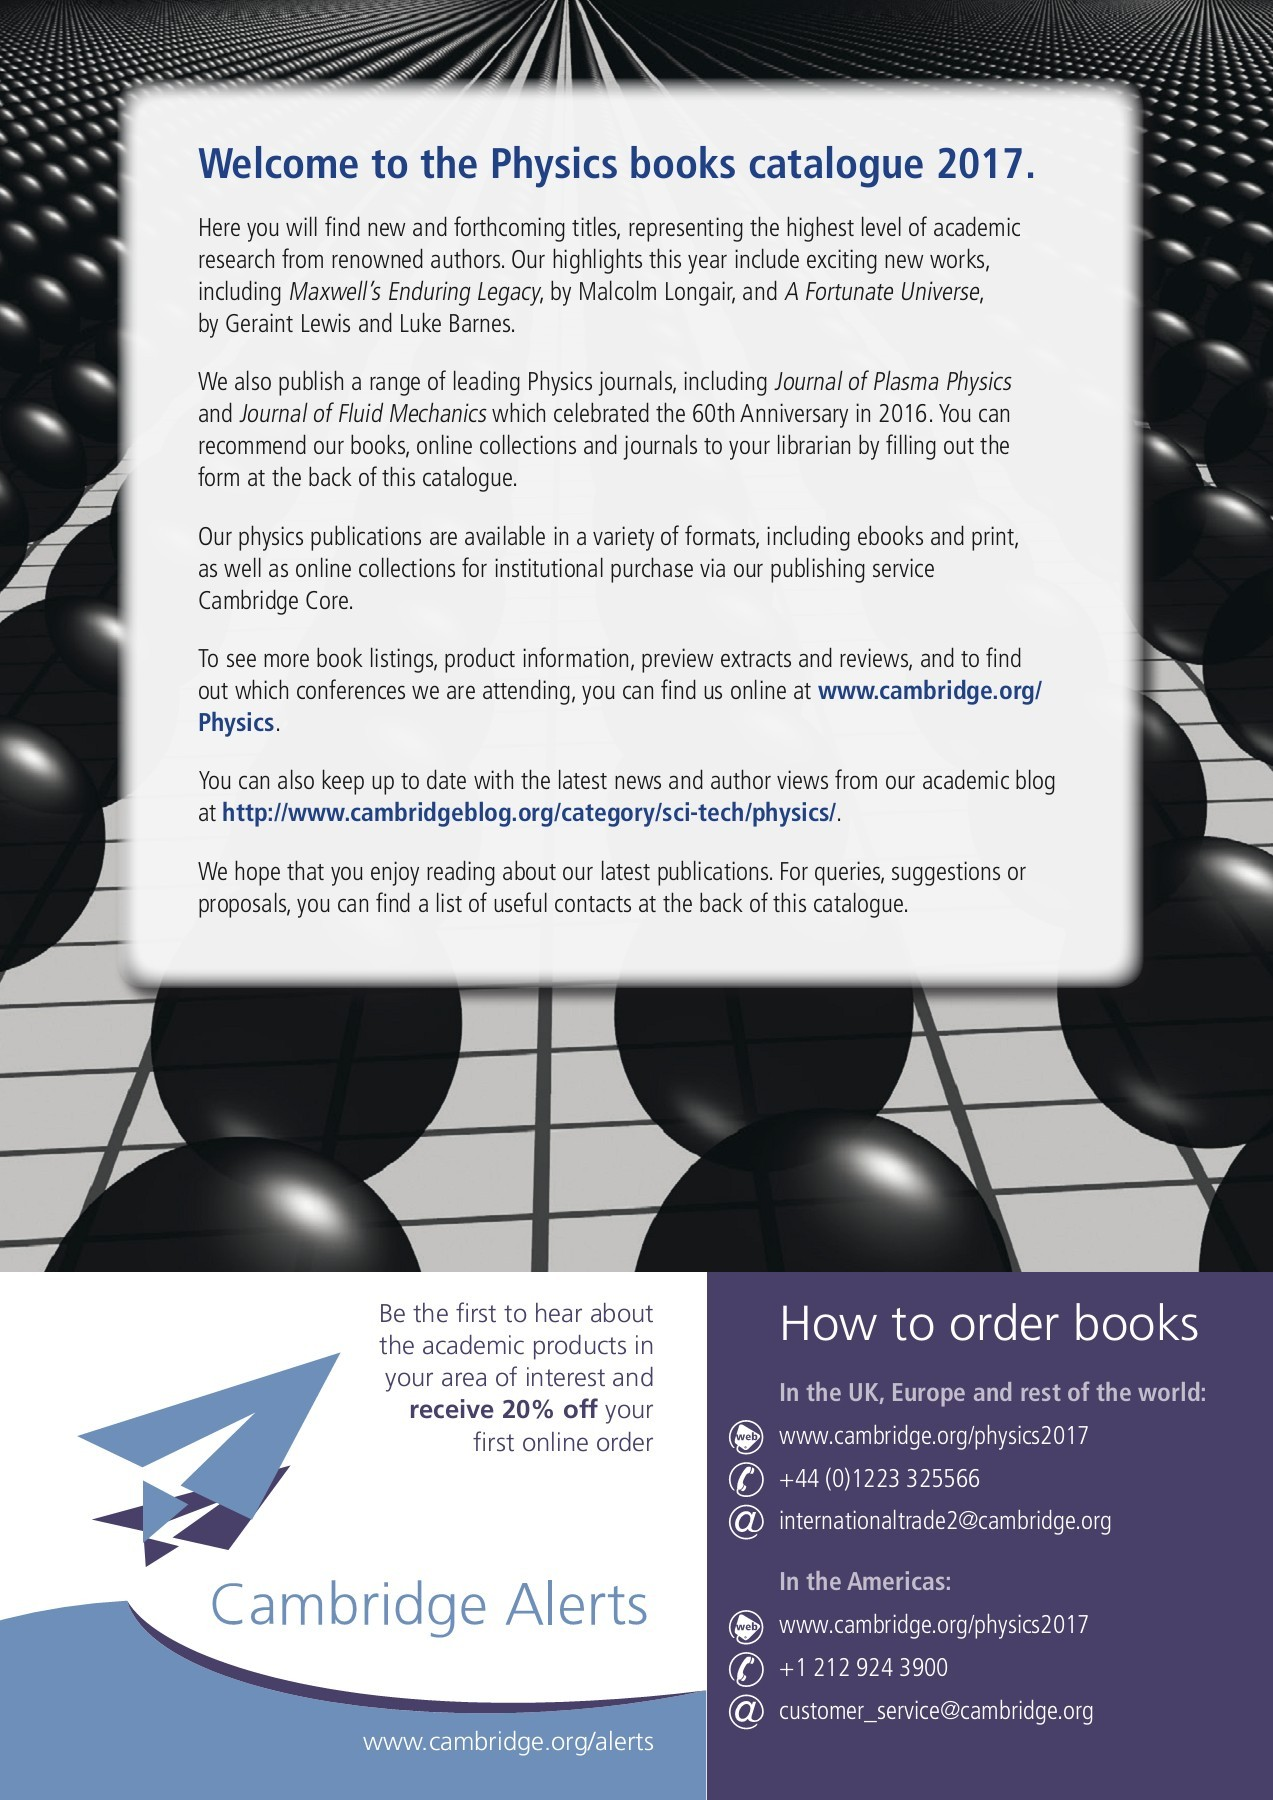 Physics Manual Ebook Traxxas Slash 4x4 Parts Breakdown Bing Images Array Icao Wgs84 Rh Nitrorocks De